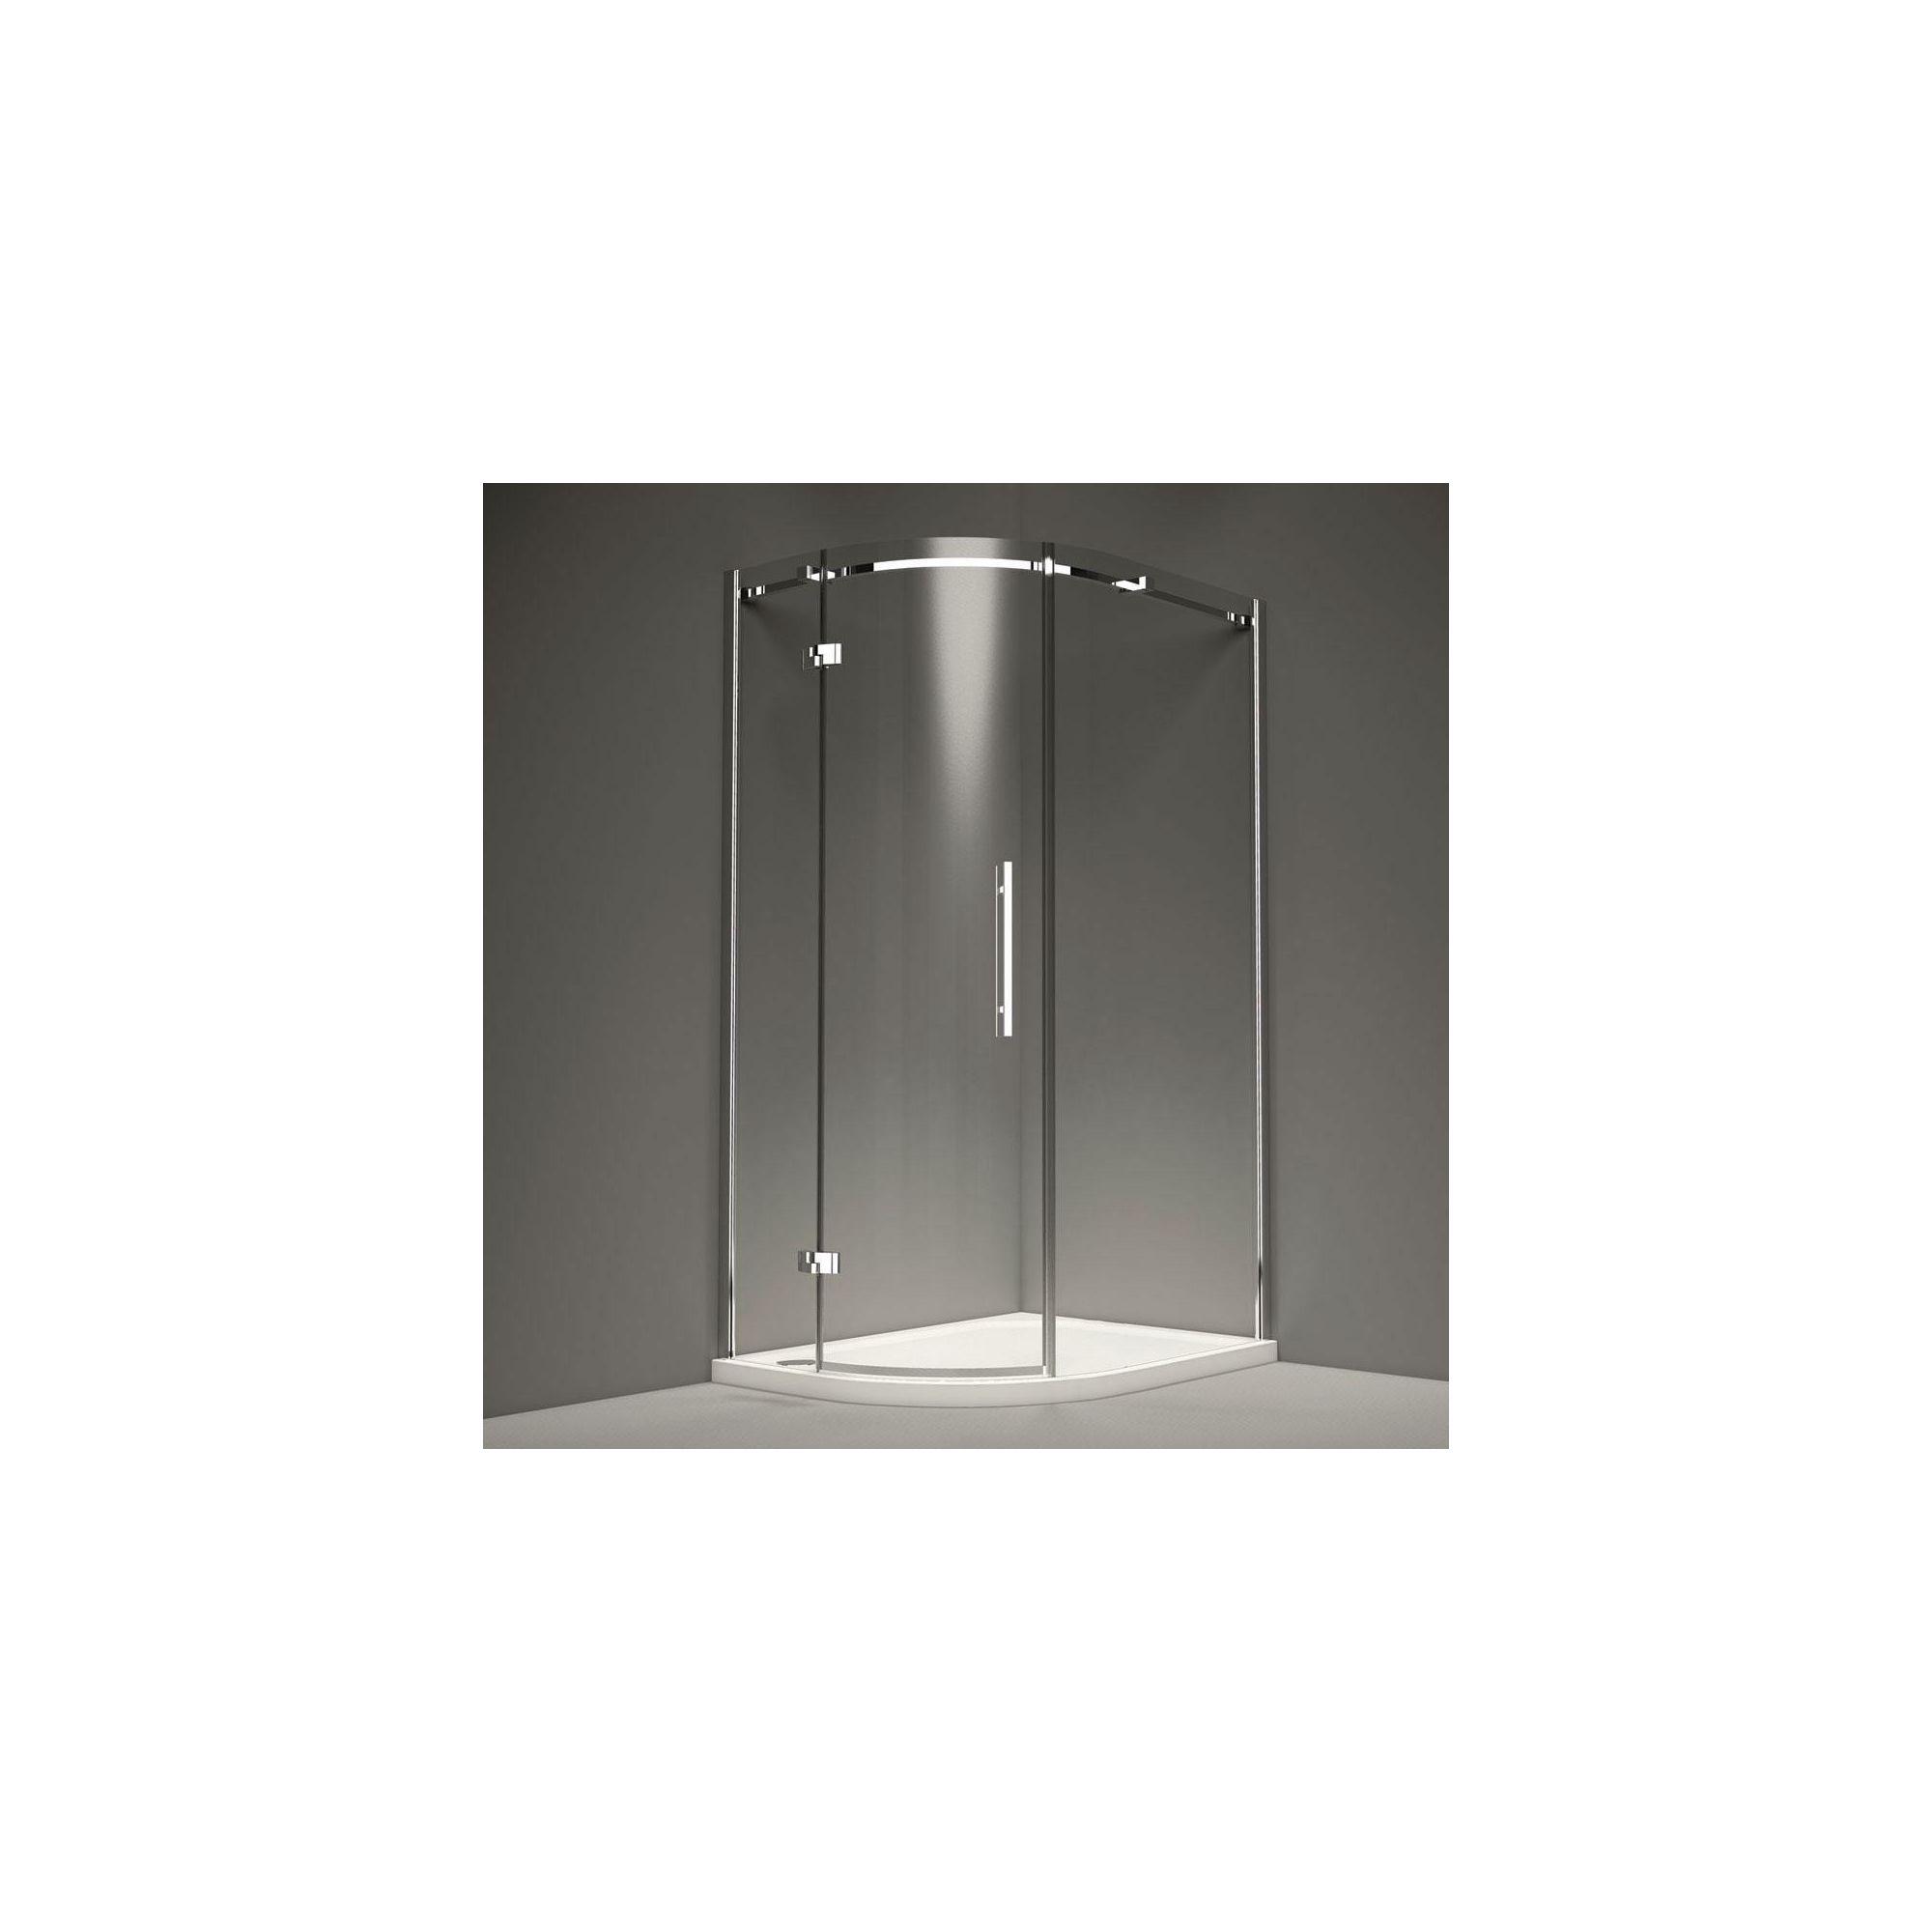 Merlyn Series 9 Single Quadrant Shower Door, 800mm x 800mm, 8mm Glass, Left Handed at Tesco Direct